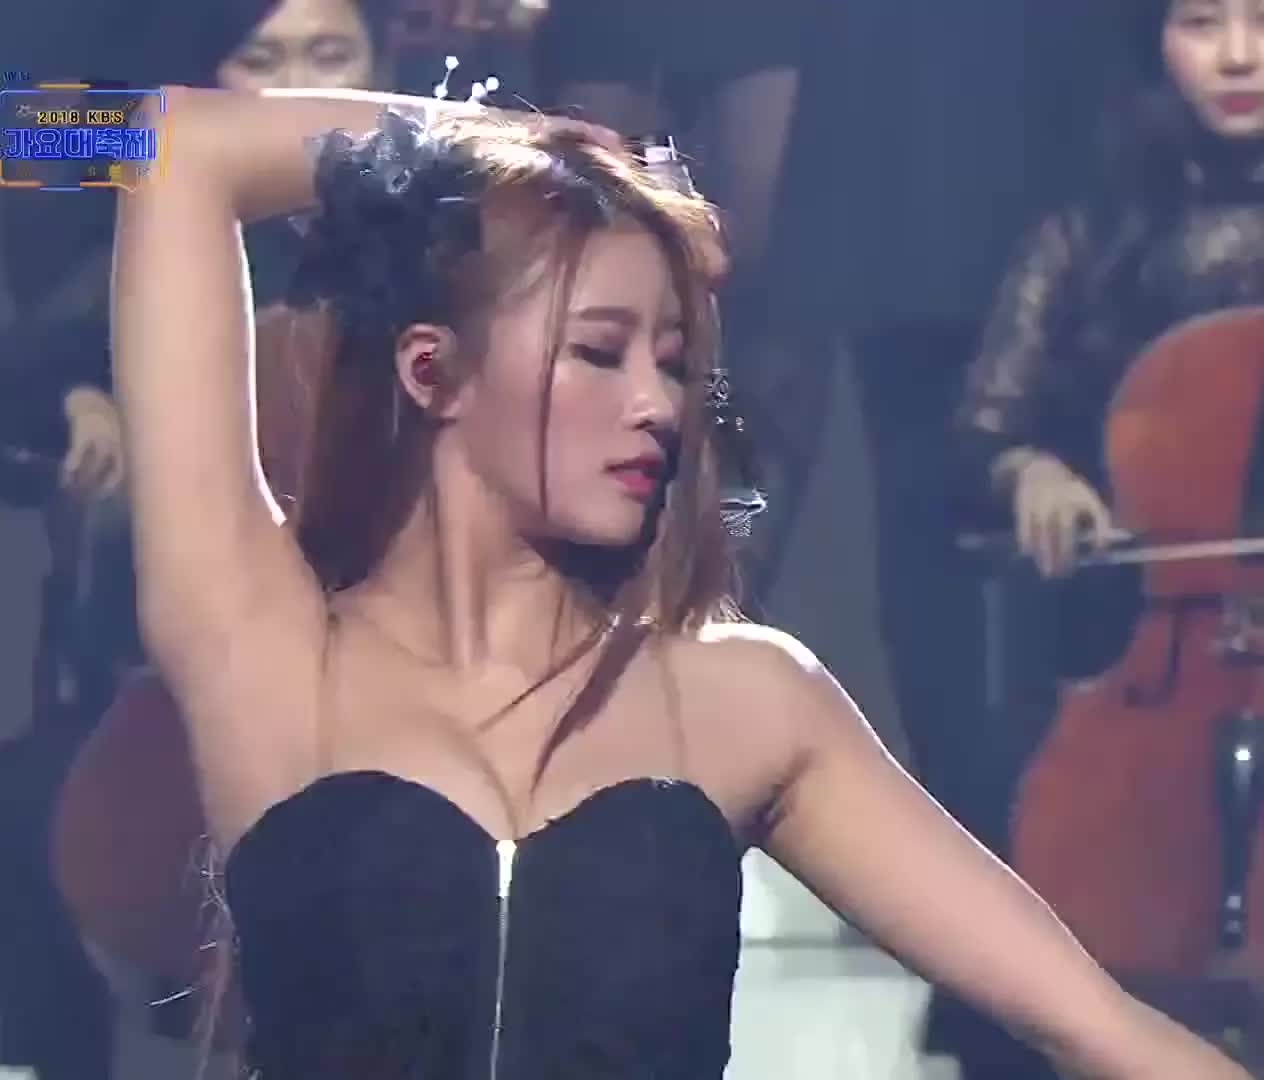 kpop, lovelyz, mijoo, music, KBS가요대축제 -러블리즈 - Intro + 그날의 너 20181228 GIFs